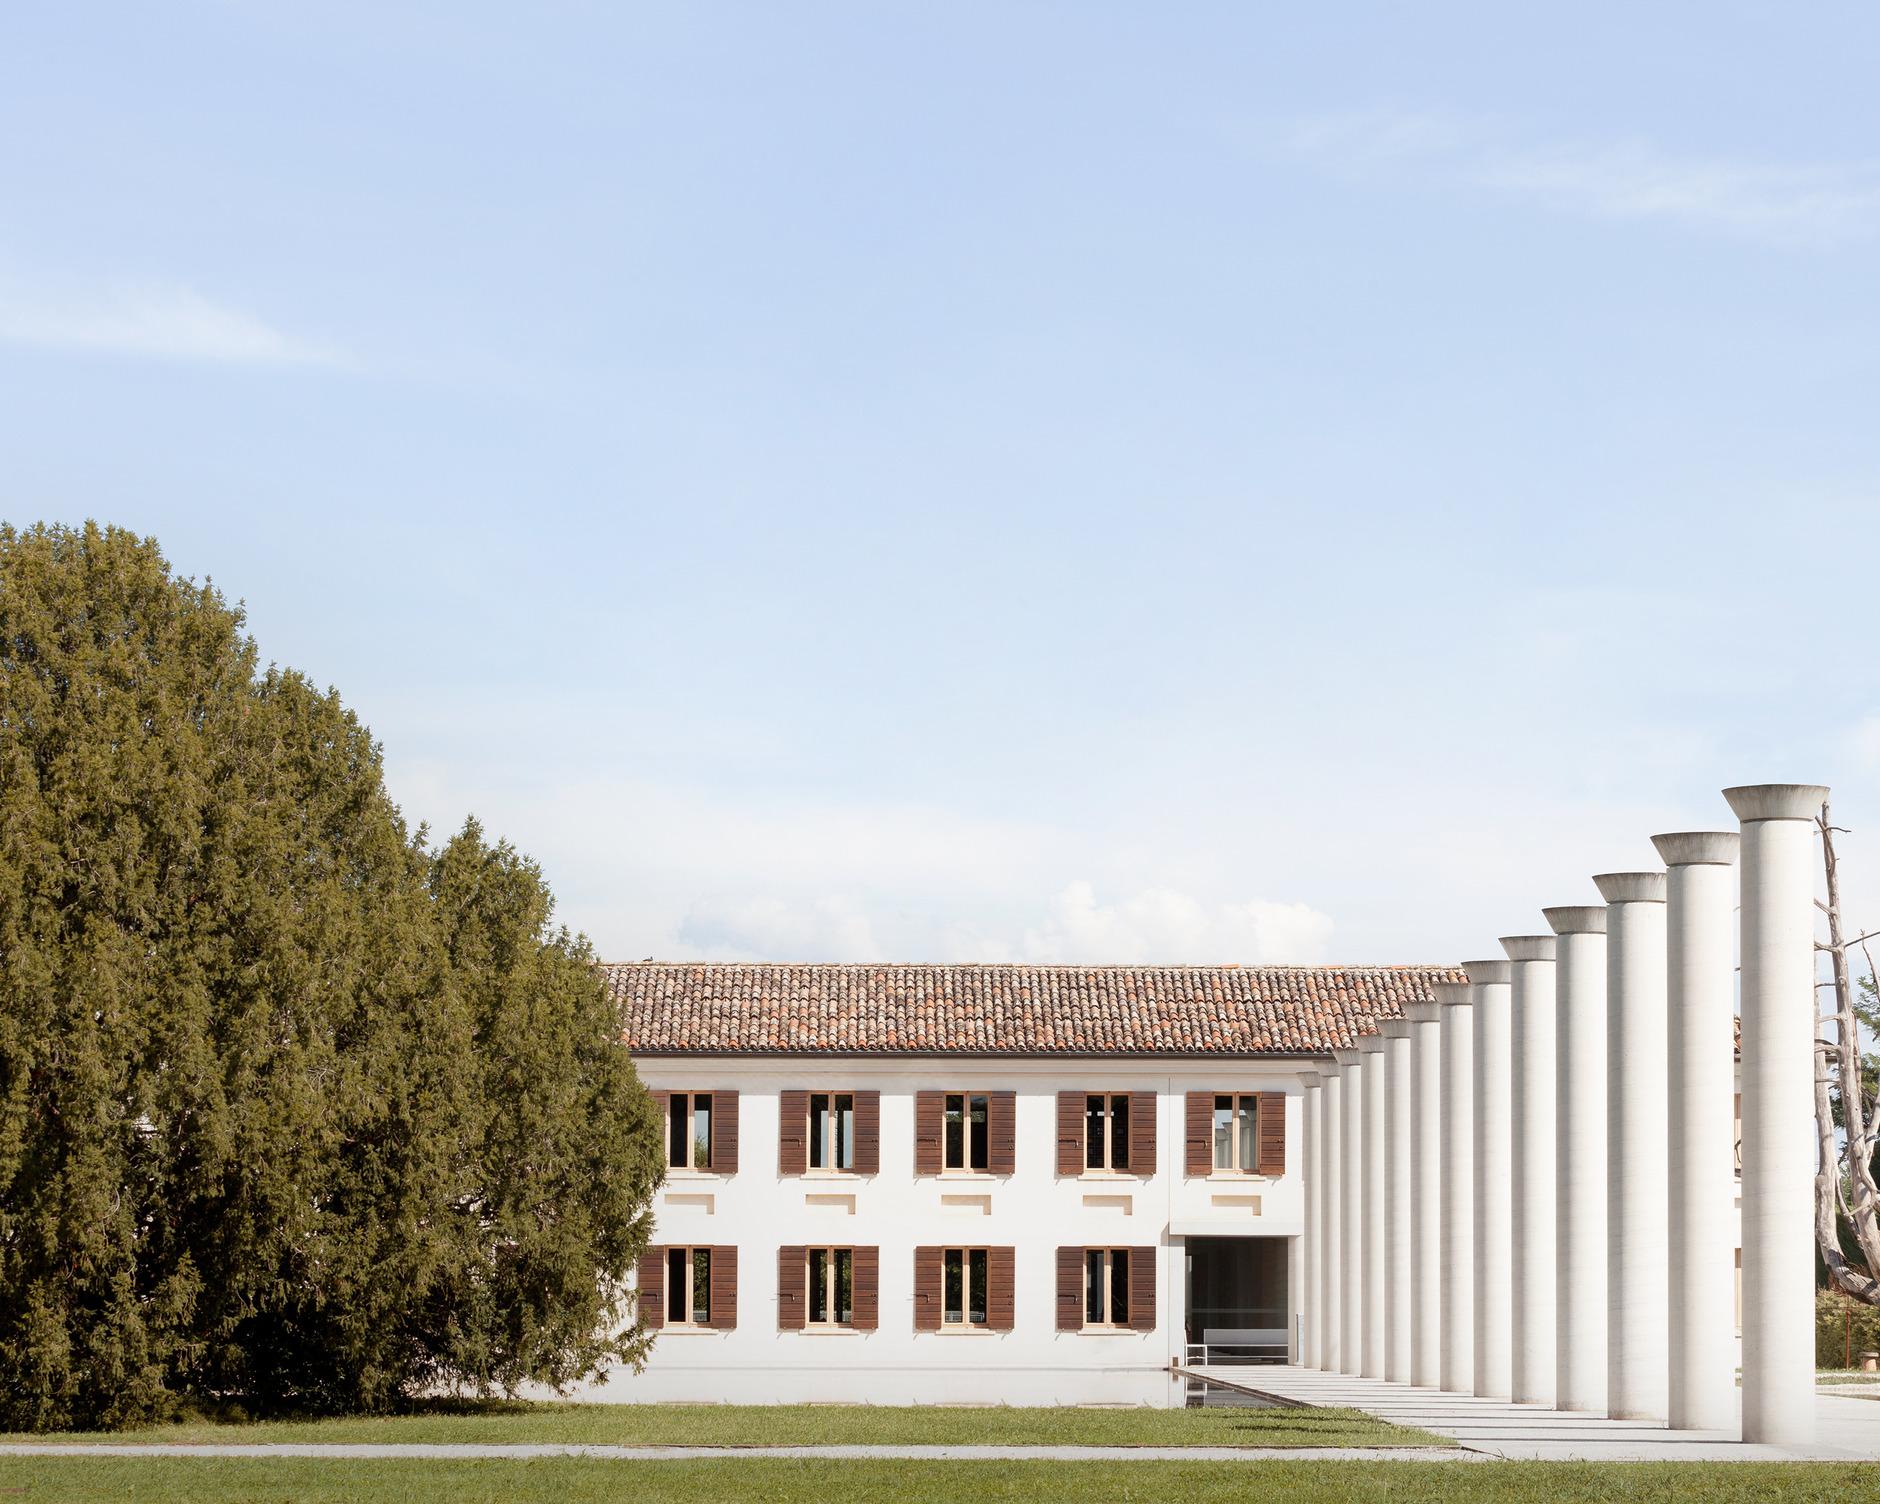 Архитектор Тадао Андо: певец бетона (галерея 15, фото 2)